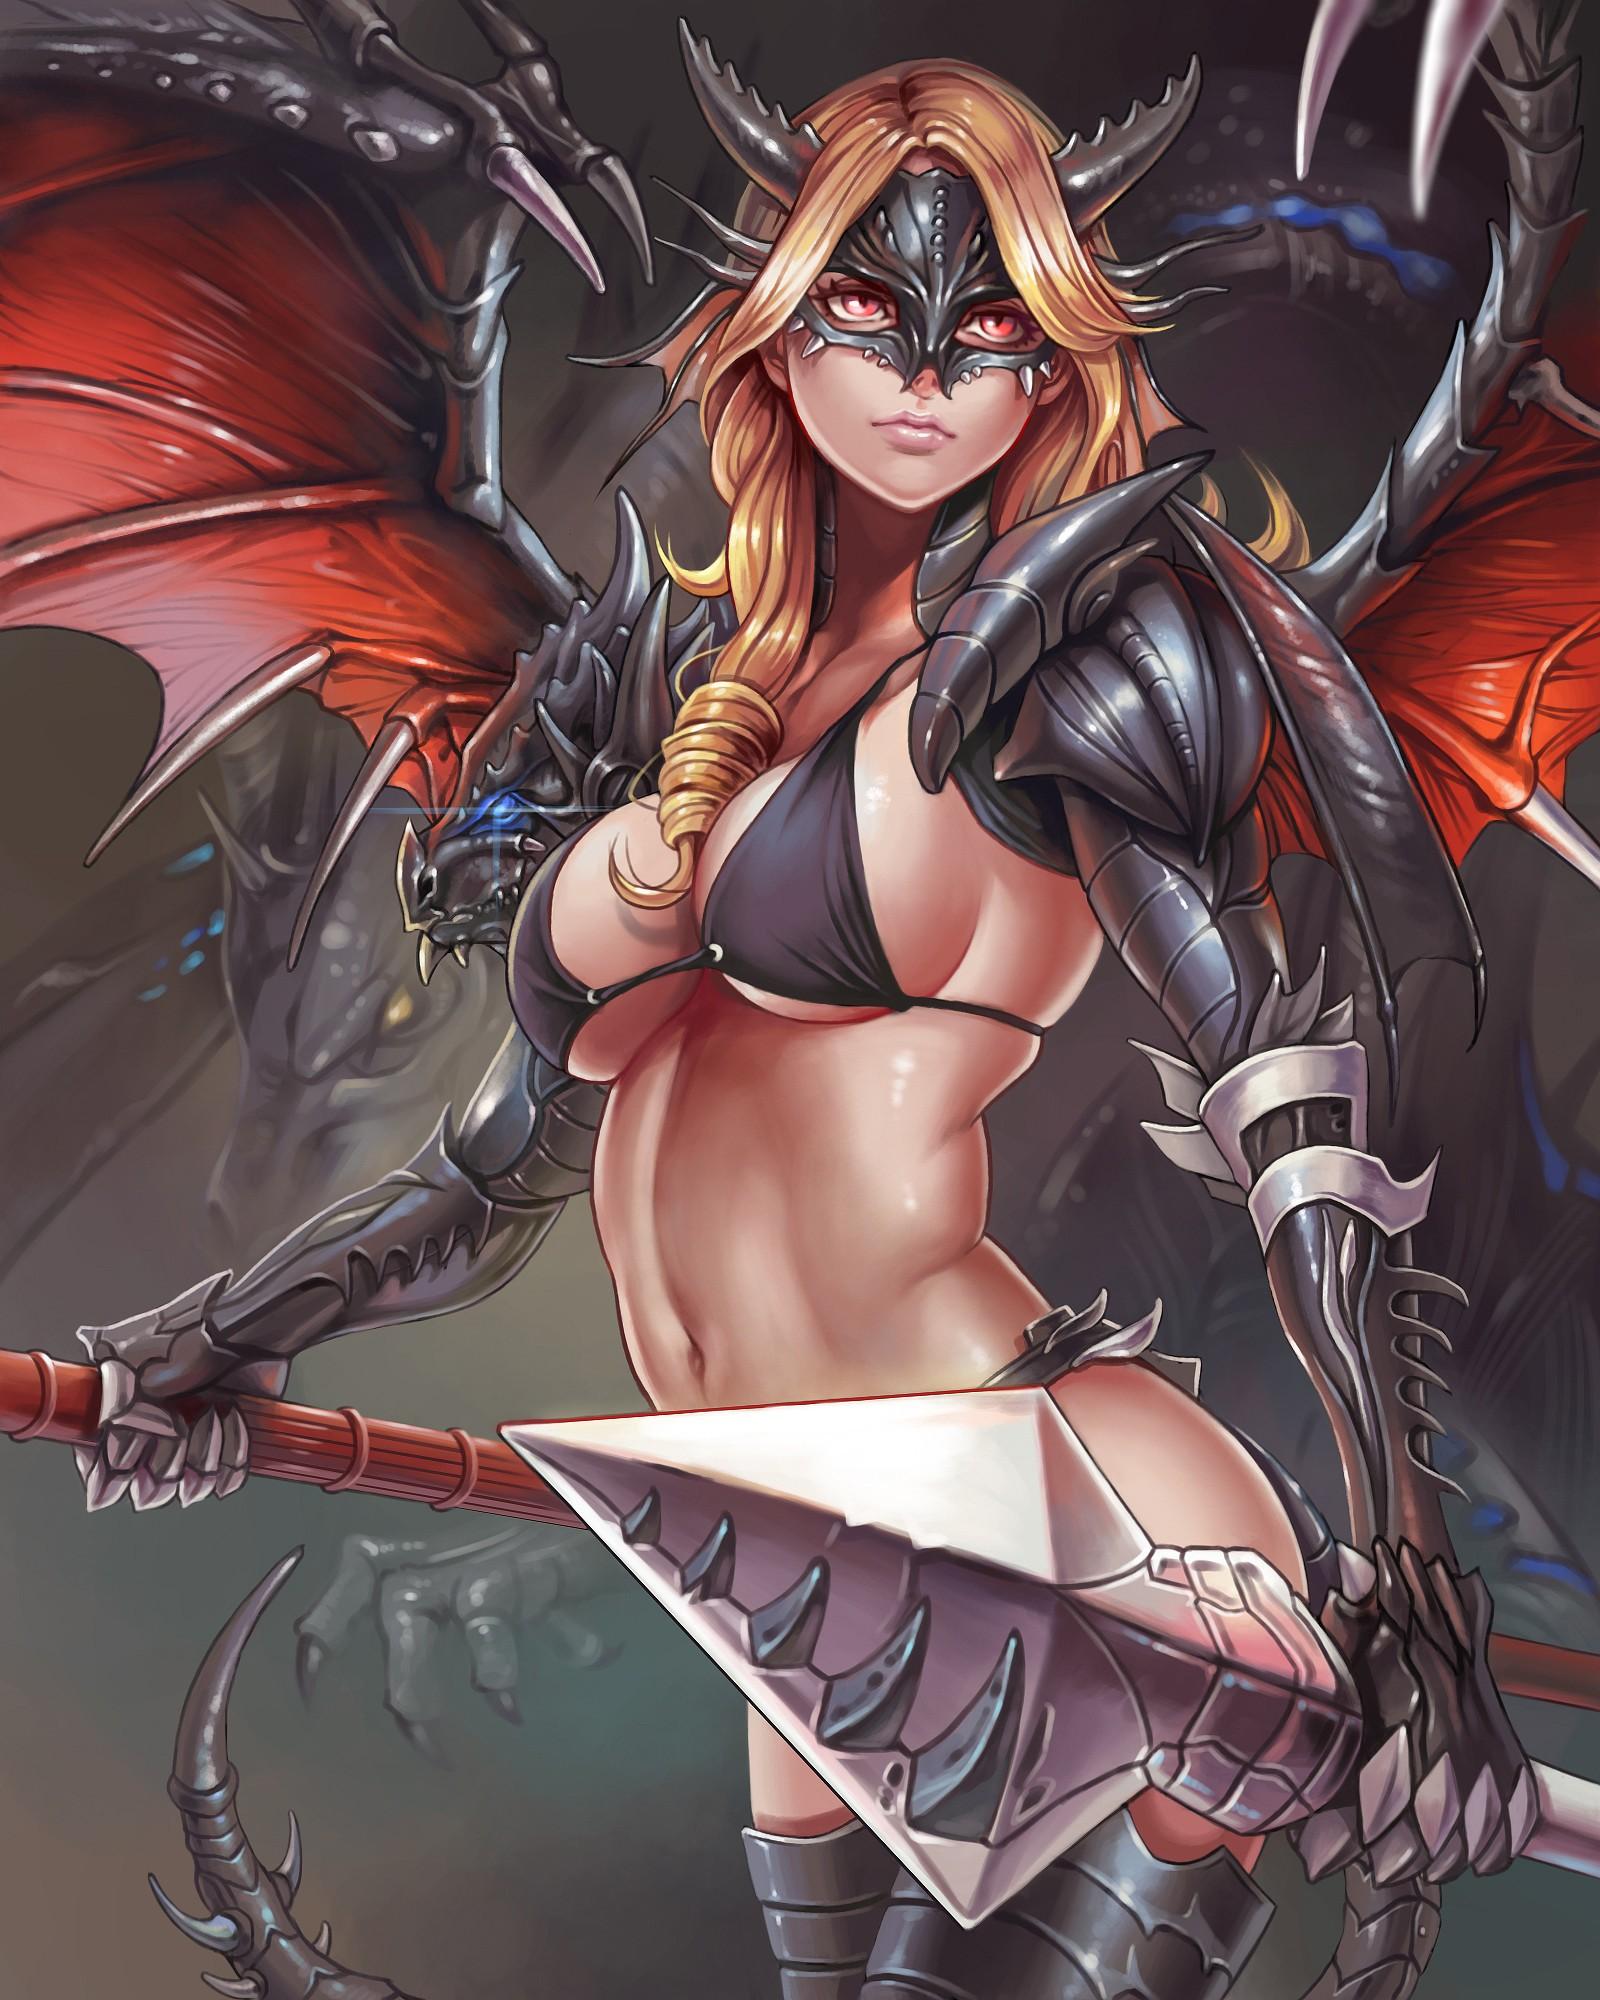 Druid girl fucks a dragon xxx pics